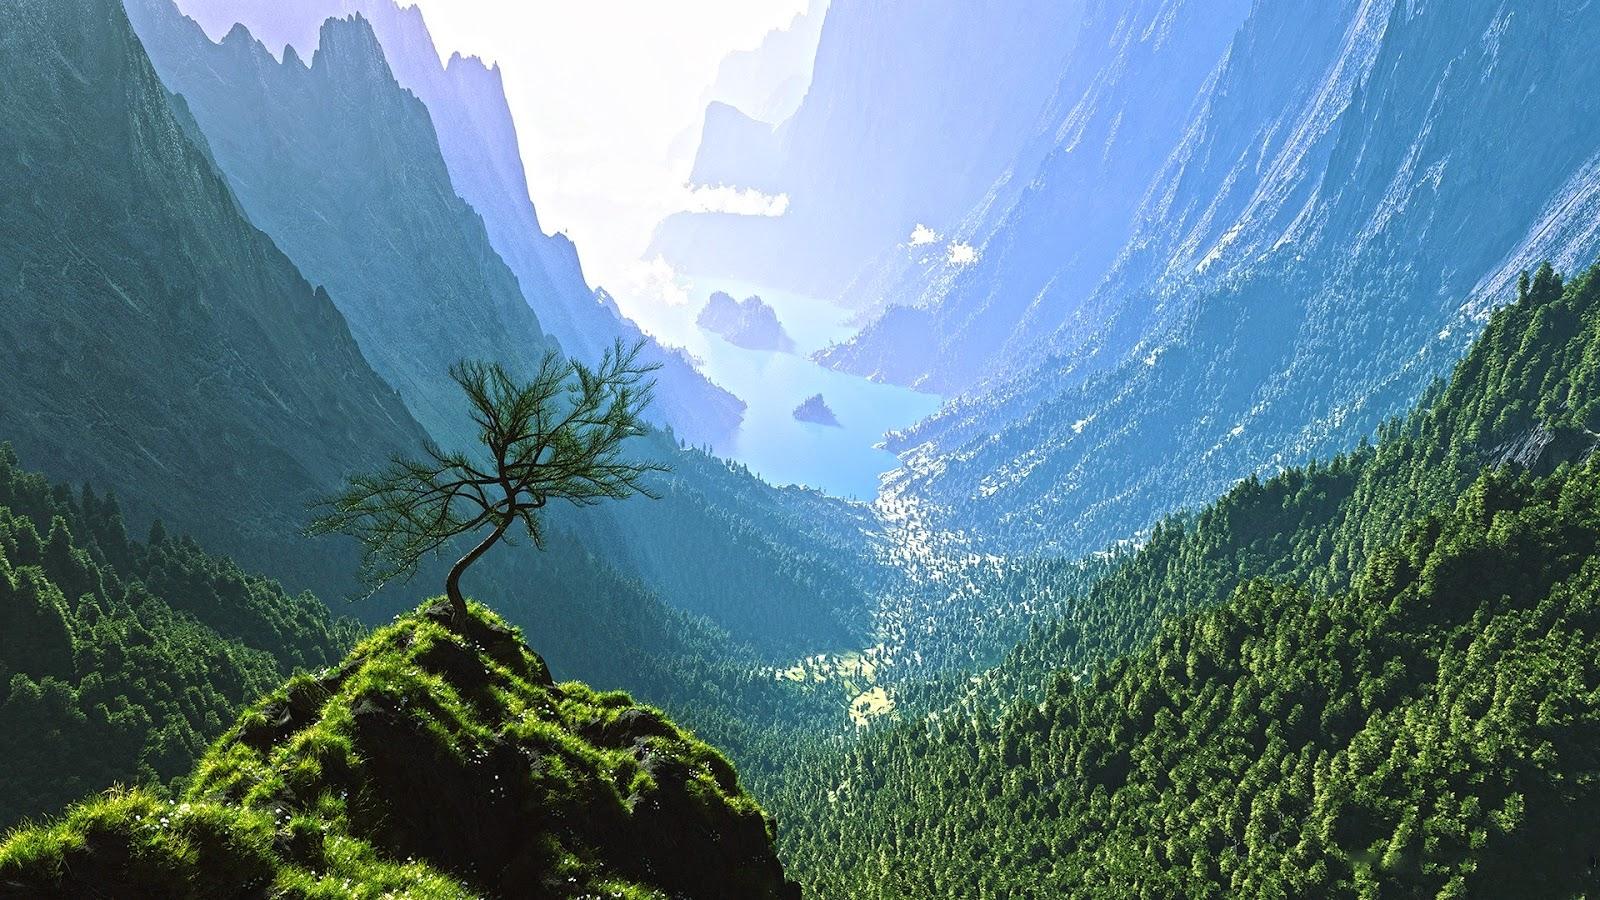 londo skala vegetation